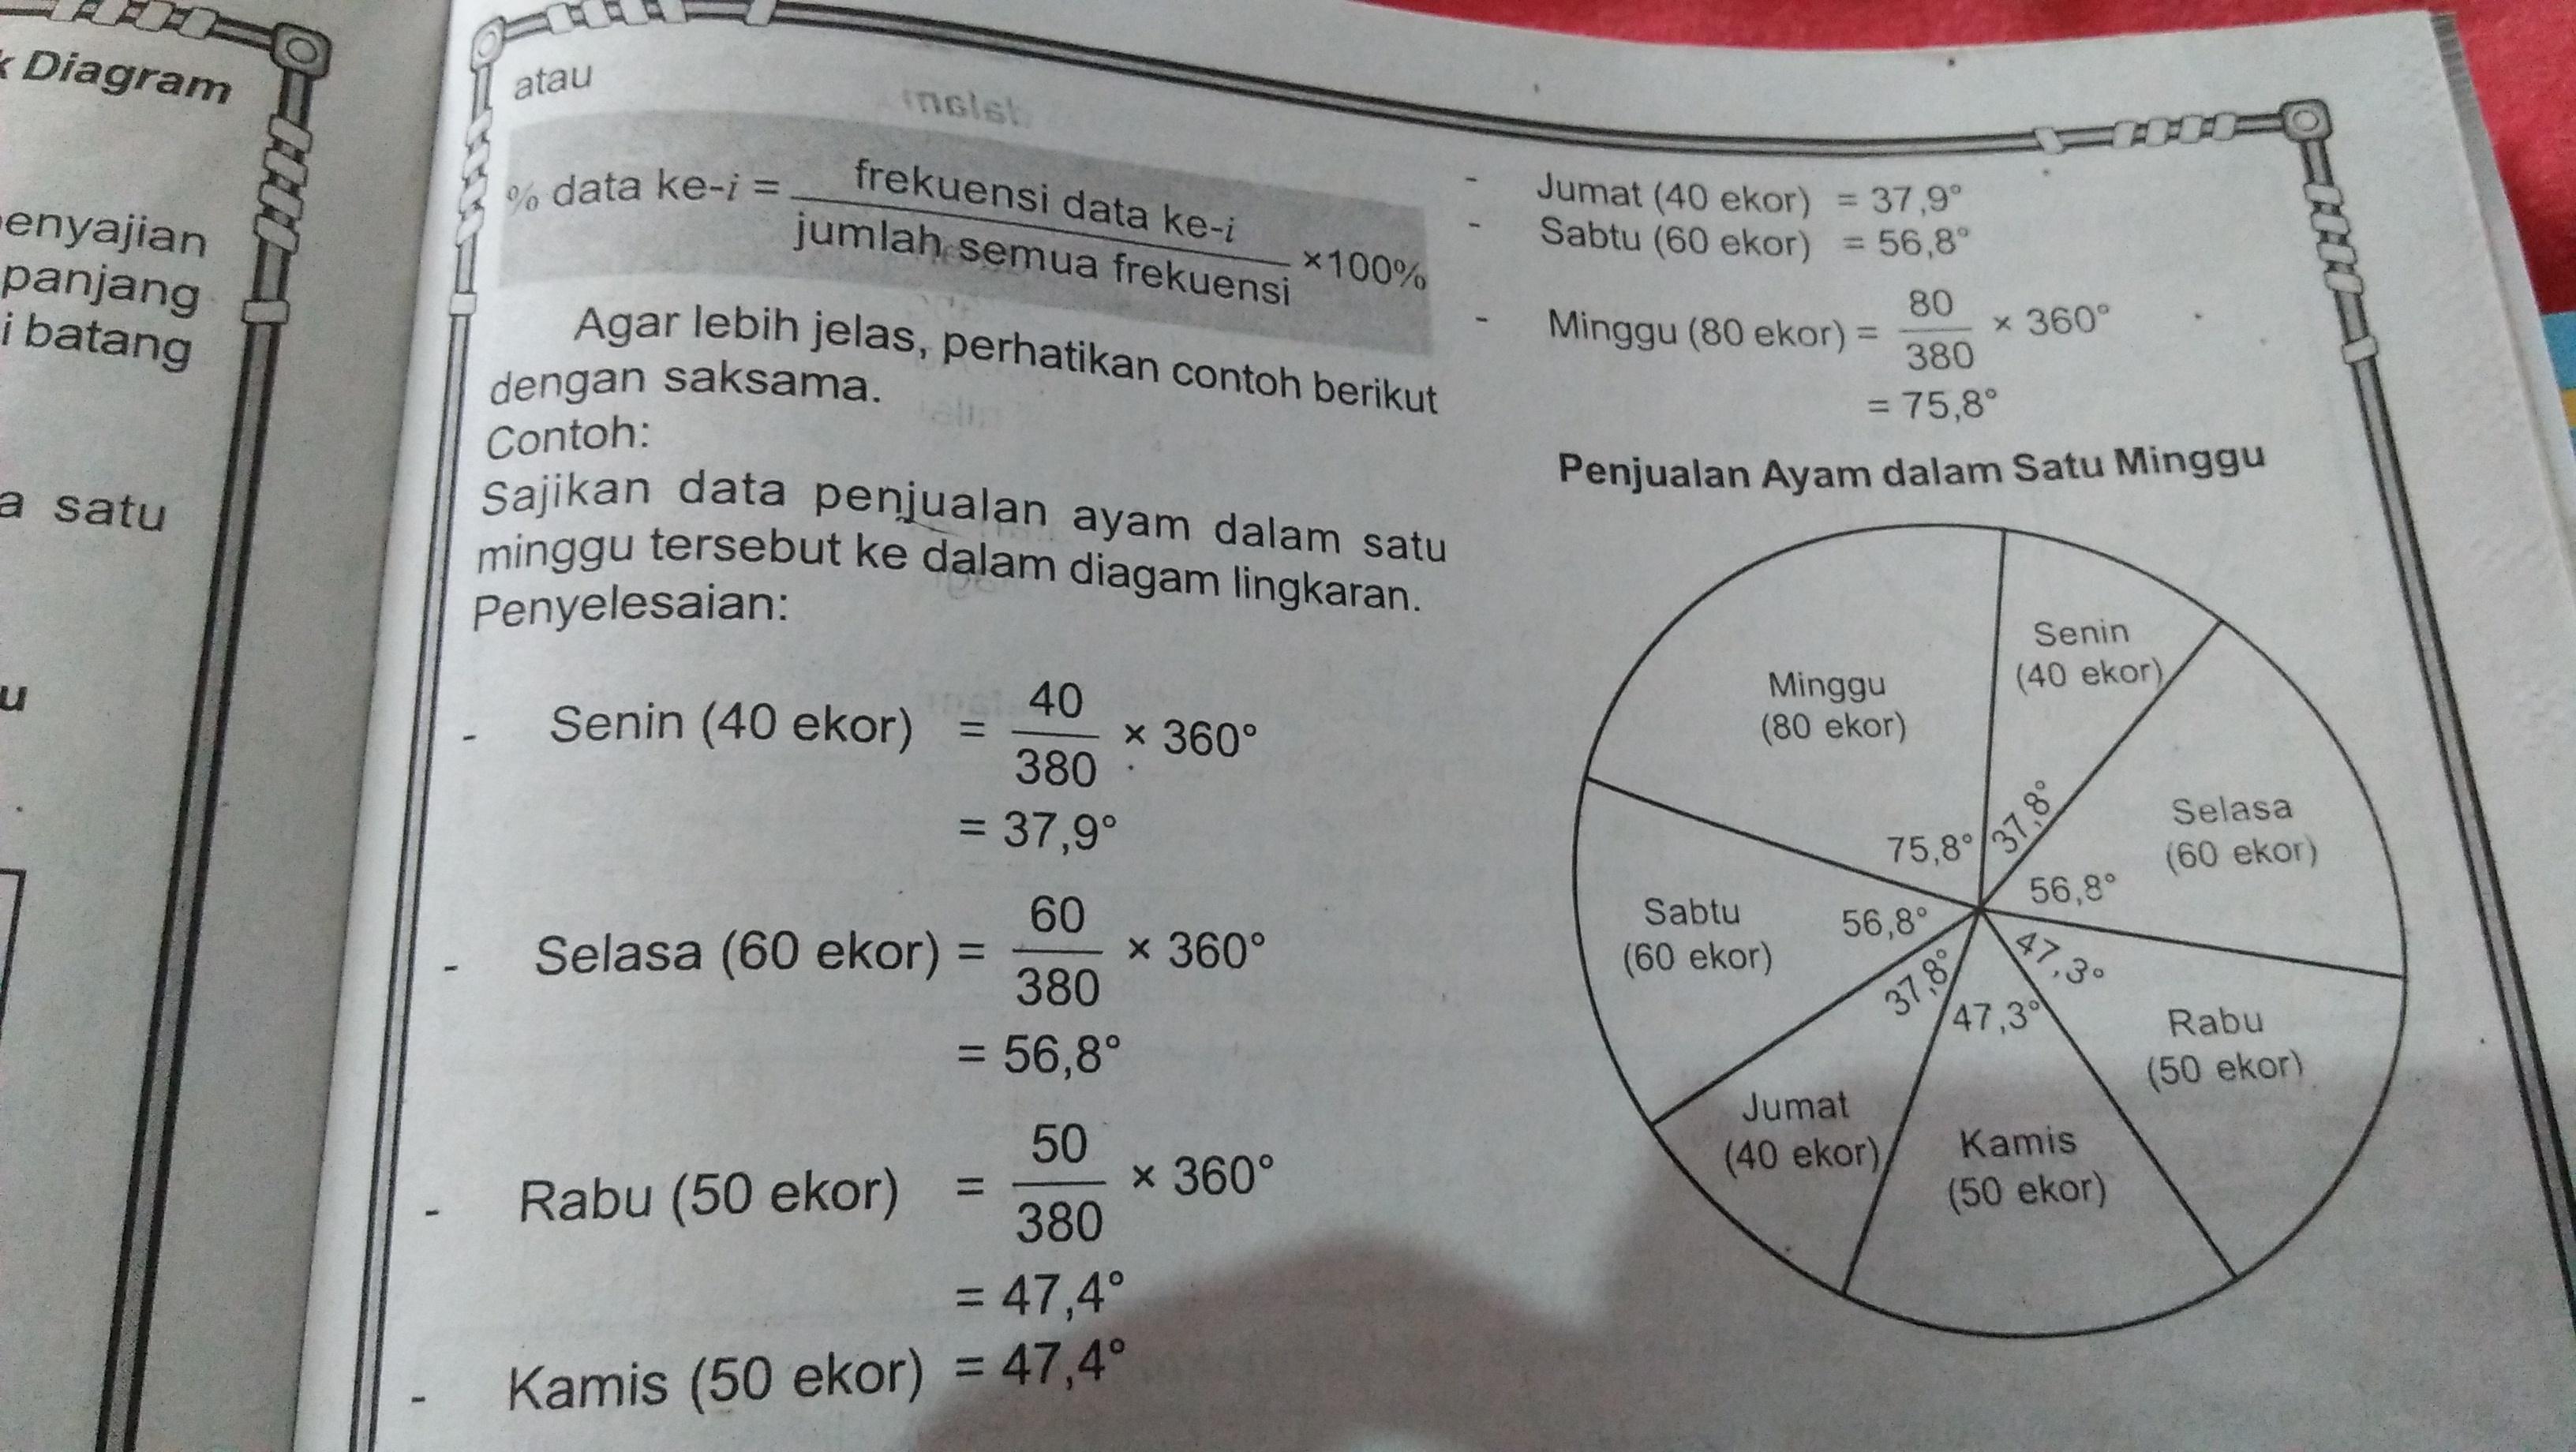 Diagram Lingkaran Yang Mewakilkan Data Tersebut Adalah